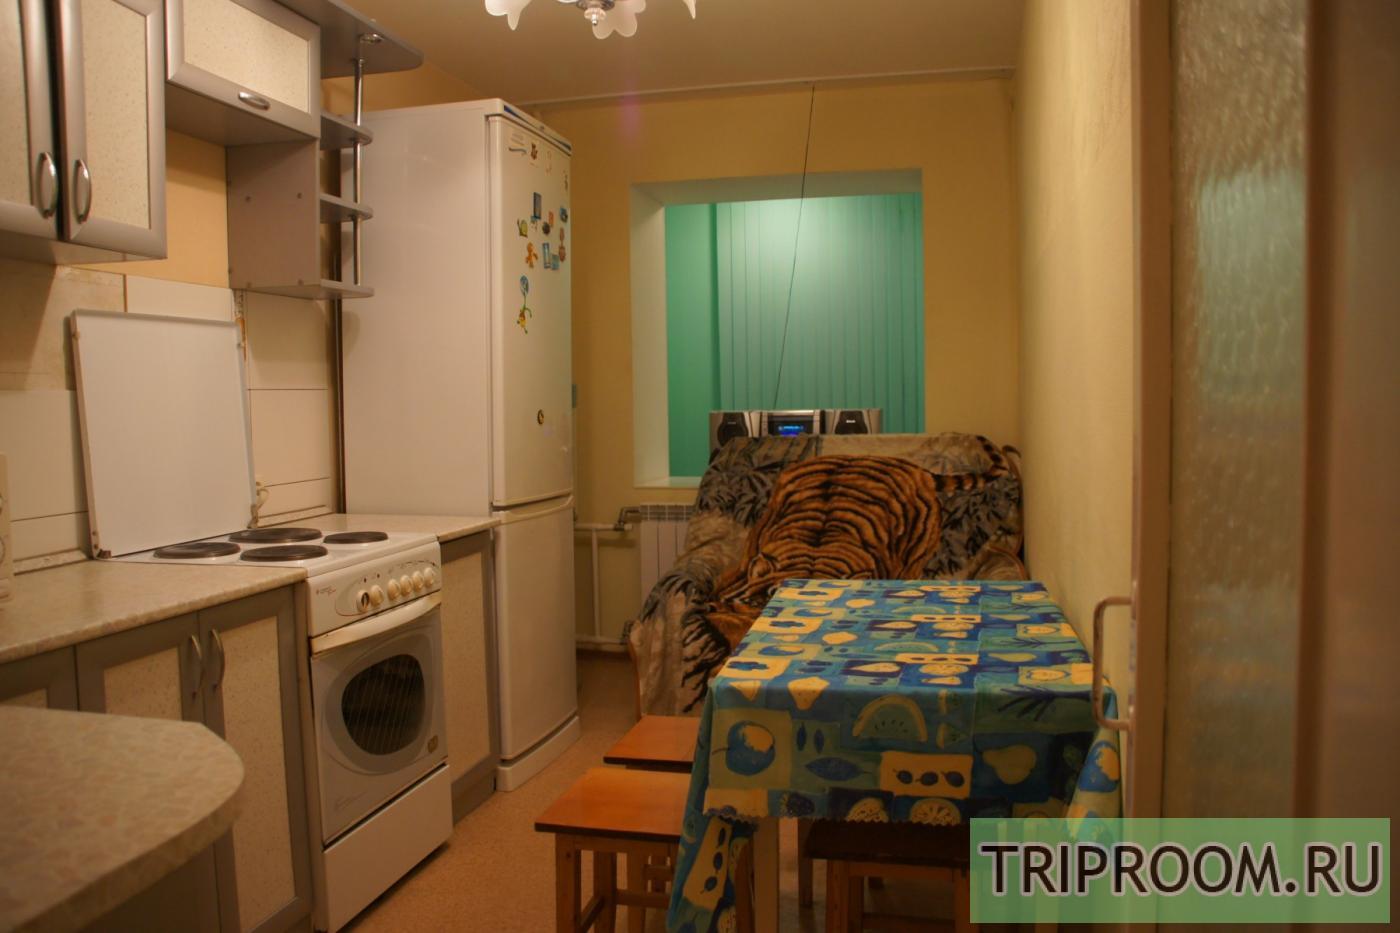 1-комнатная квартира посуточно (вариант № 30339), ул. Пархоменко улица, фото № 5